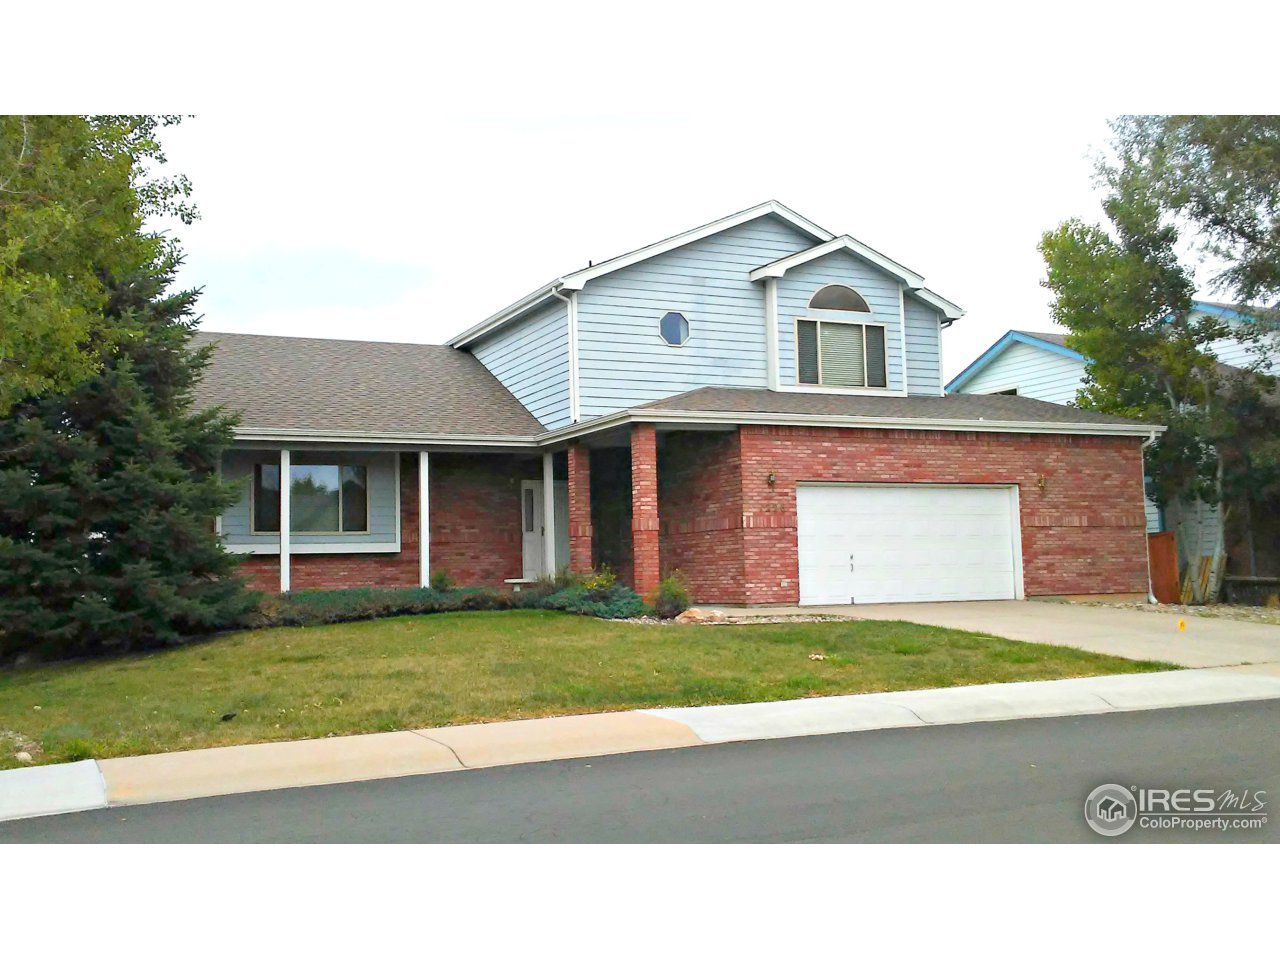 1226 Lakecrest Ct, Fort Collins CO 80526